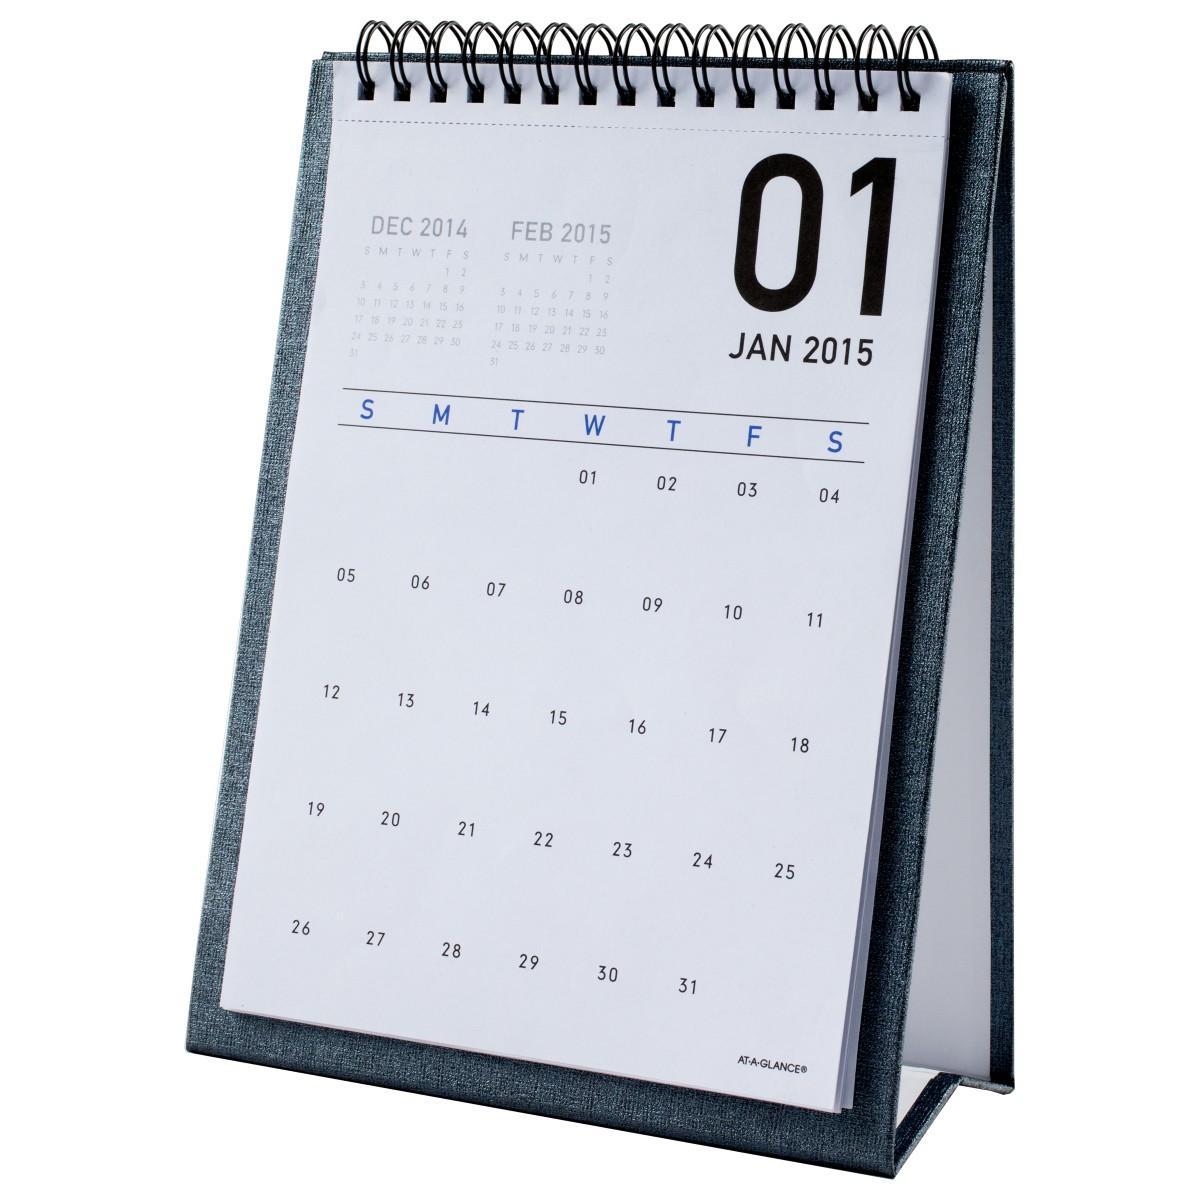 Desktop Easel Easel Calendar Standing Calendar Monthly Calendar Monthly Desk Calendar  sc 1 st  Amazon.com & Amazon.com : AT-A-GLANCE Monthly Desktop Easel Calendar 2016 5.25 ...